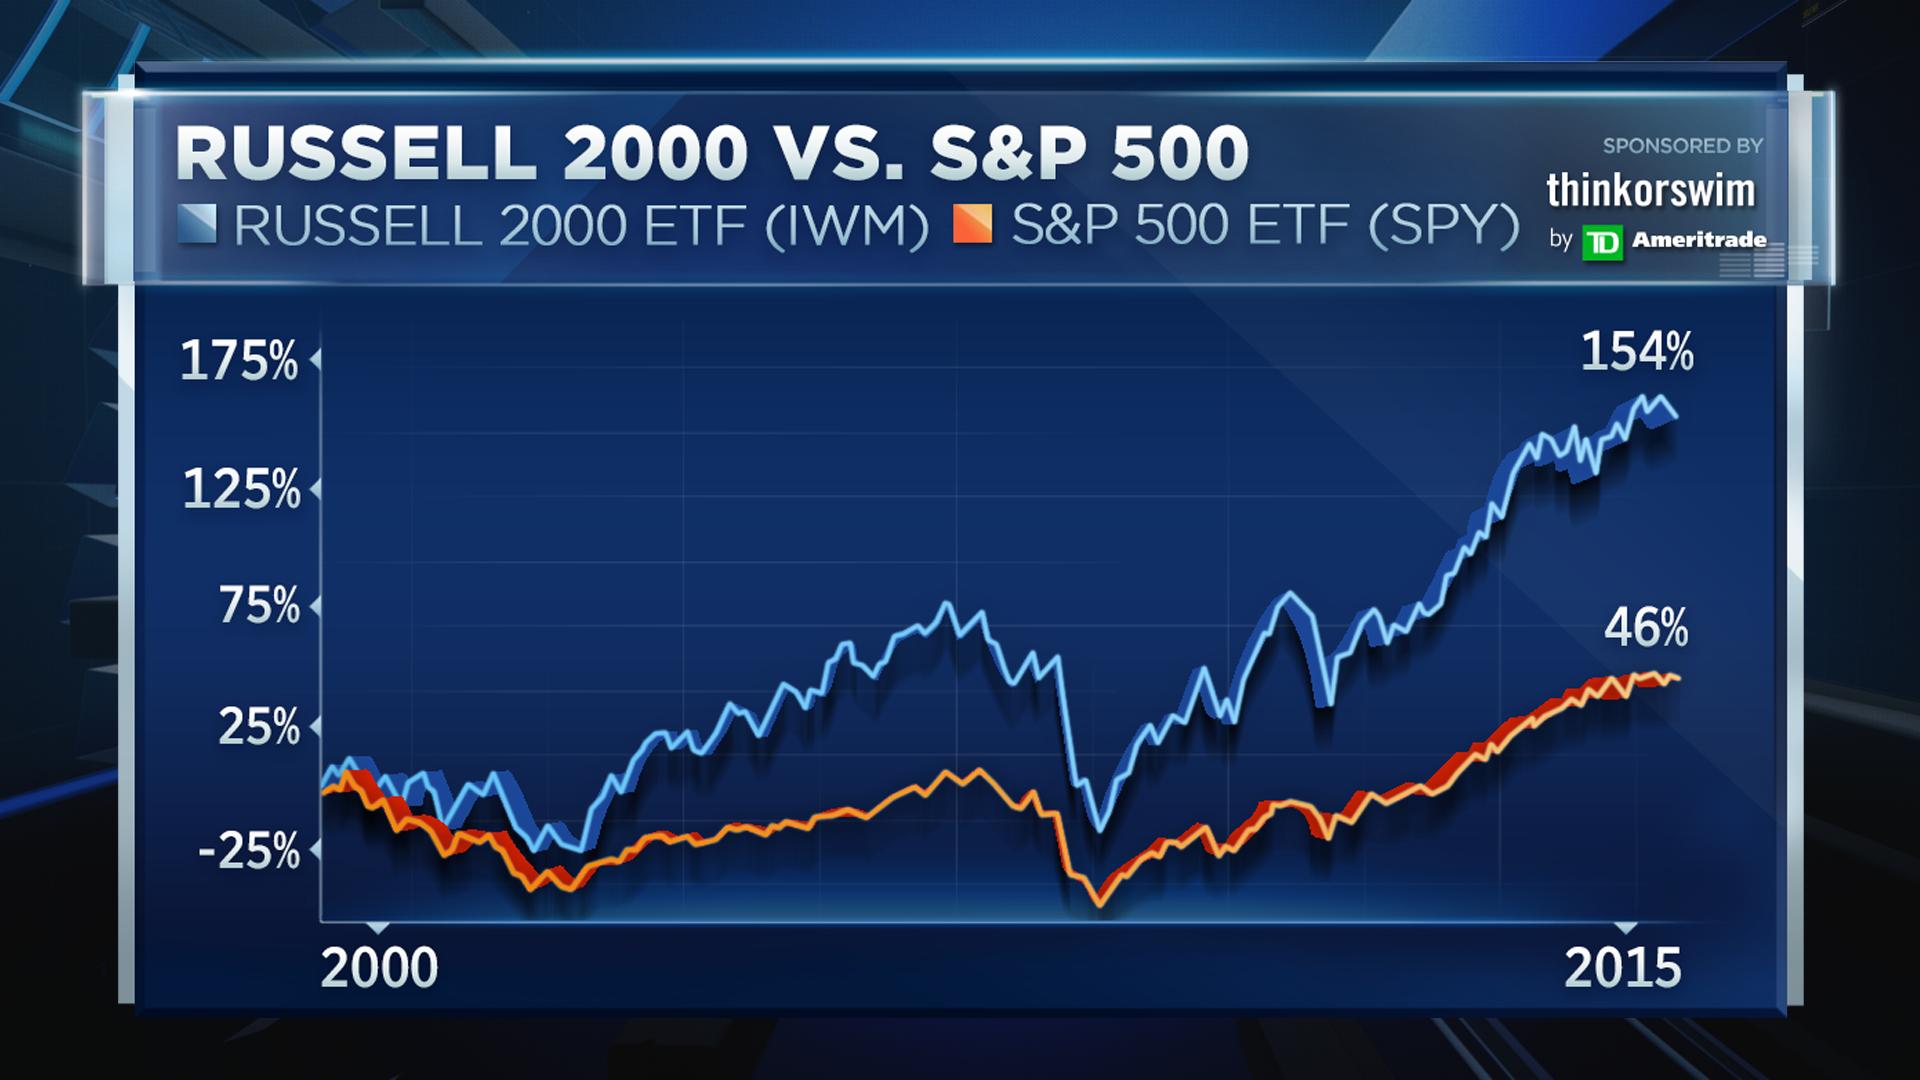 Small caps are sounding alarm for stocks: Technician